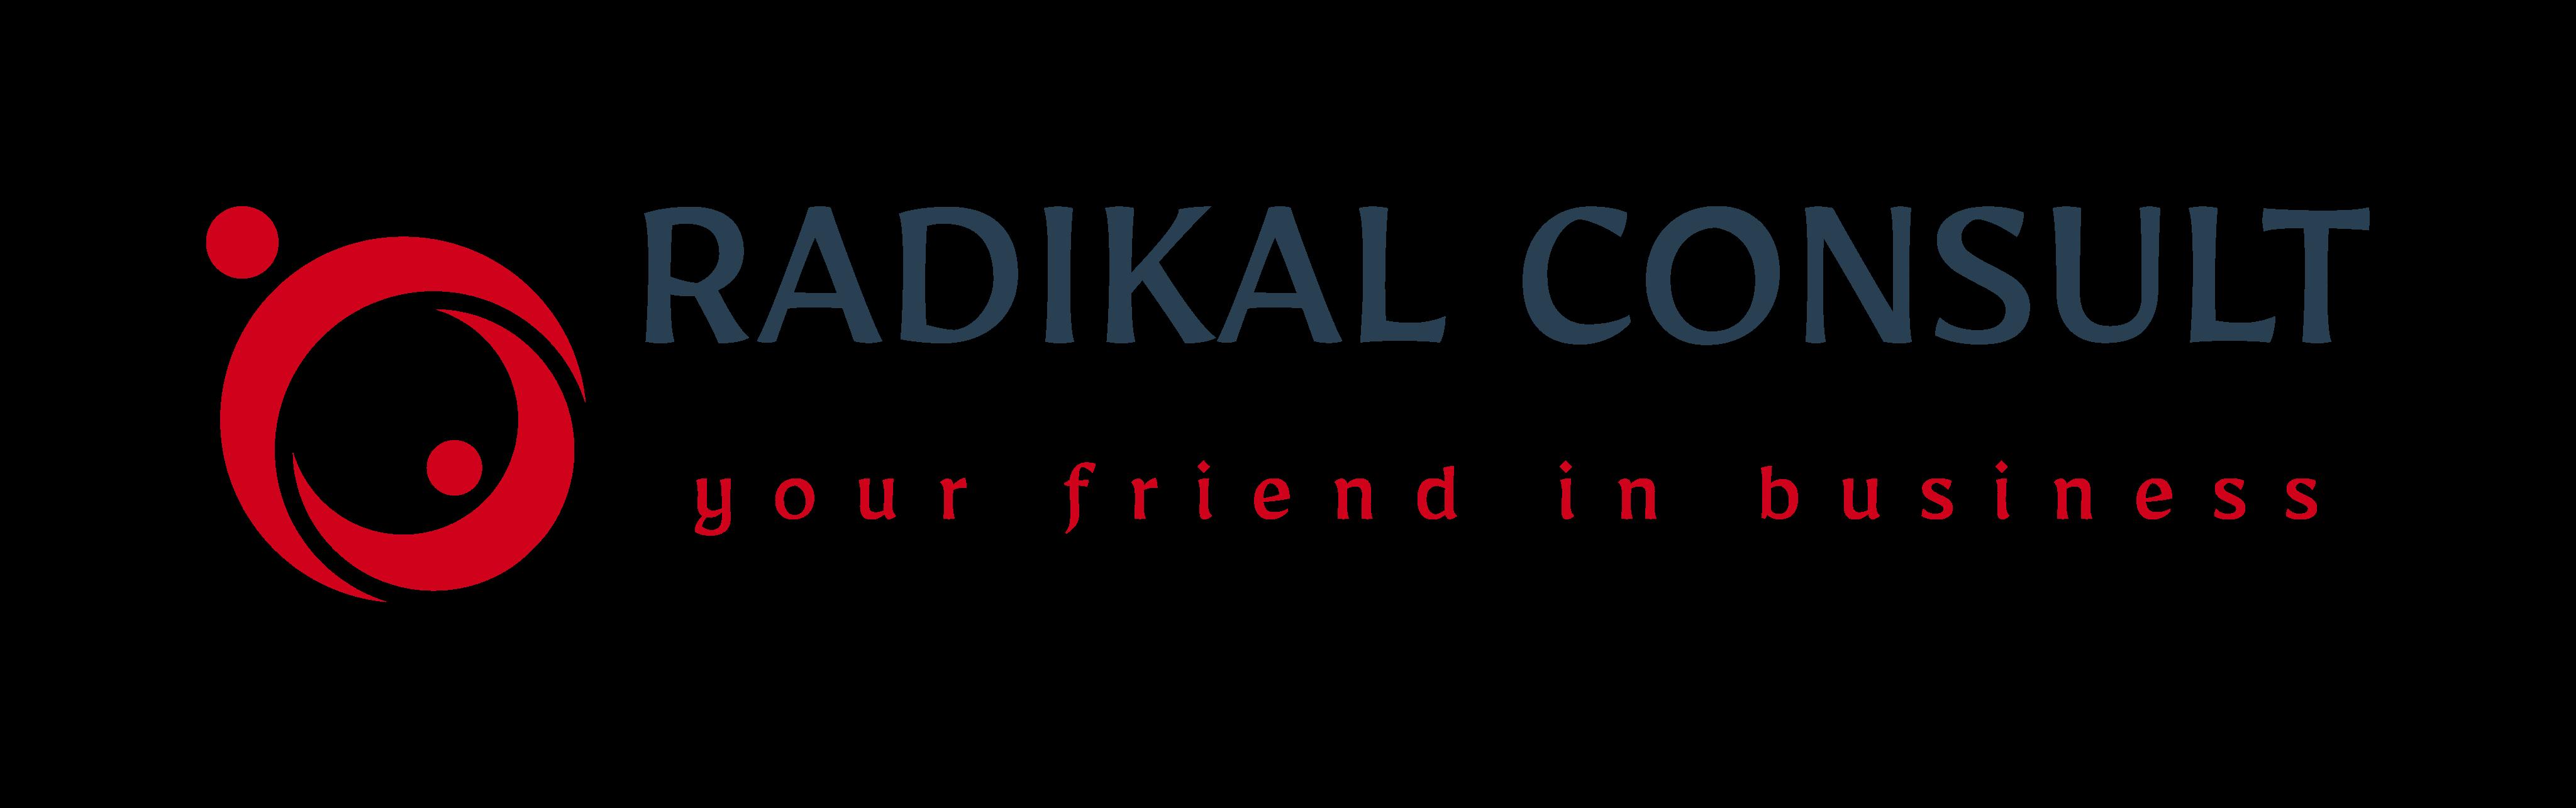 Radikal Consult